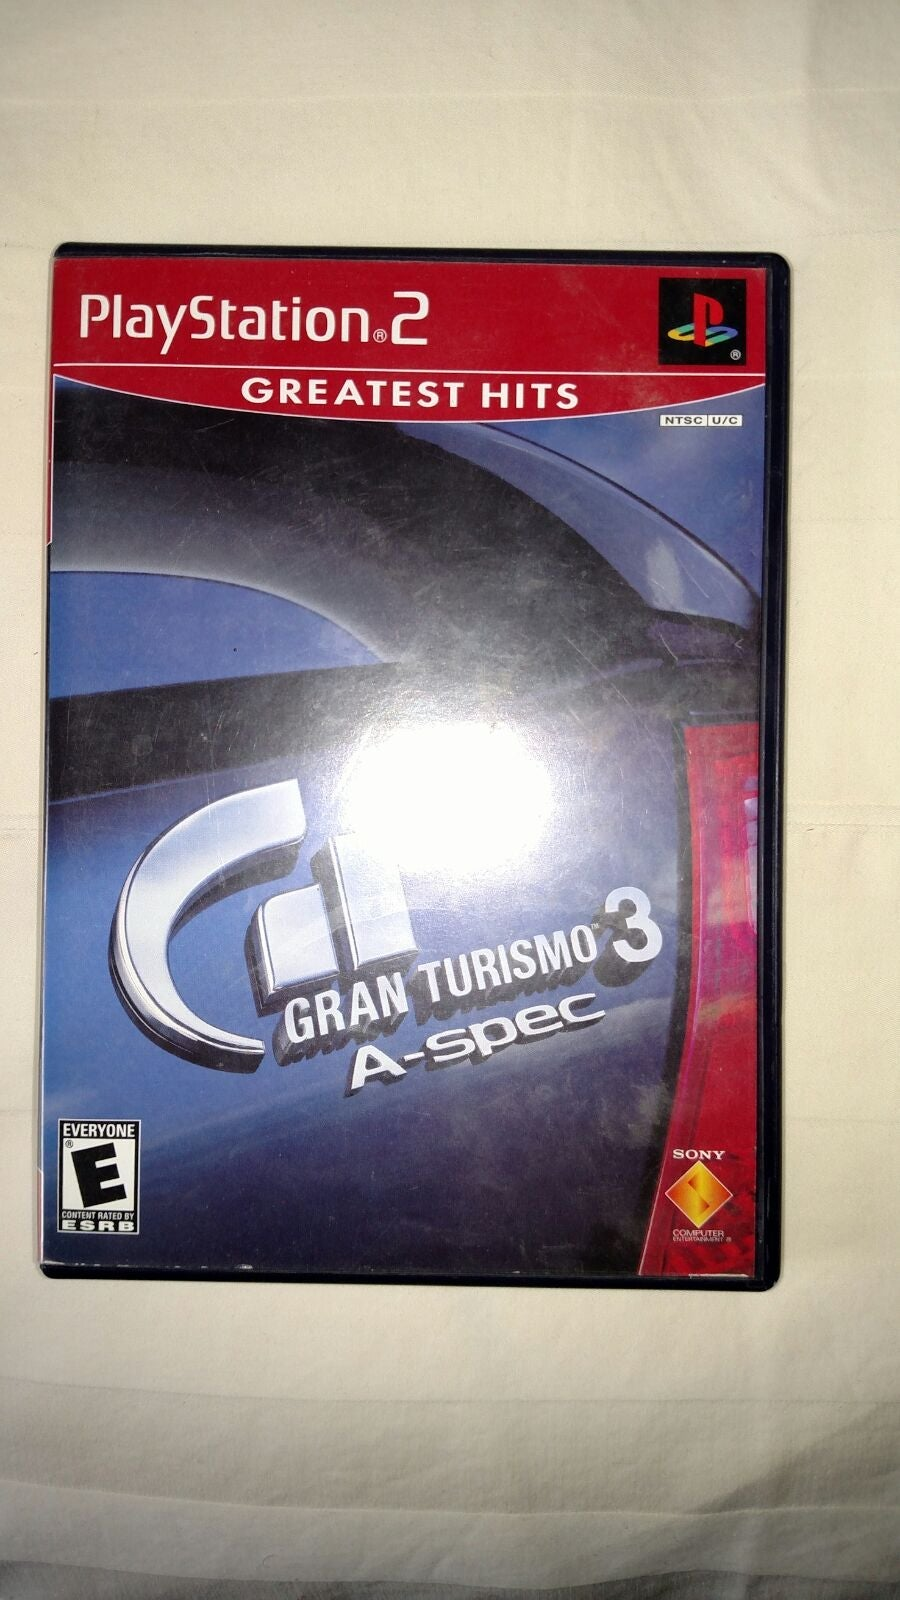 PS2 Game Disc Gran Turismo 3 A-spec